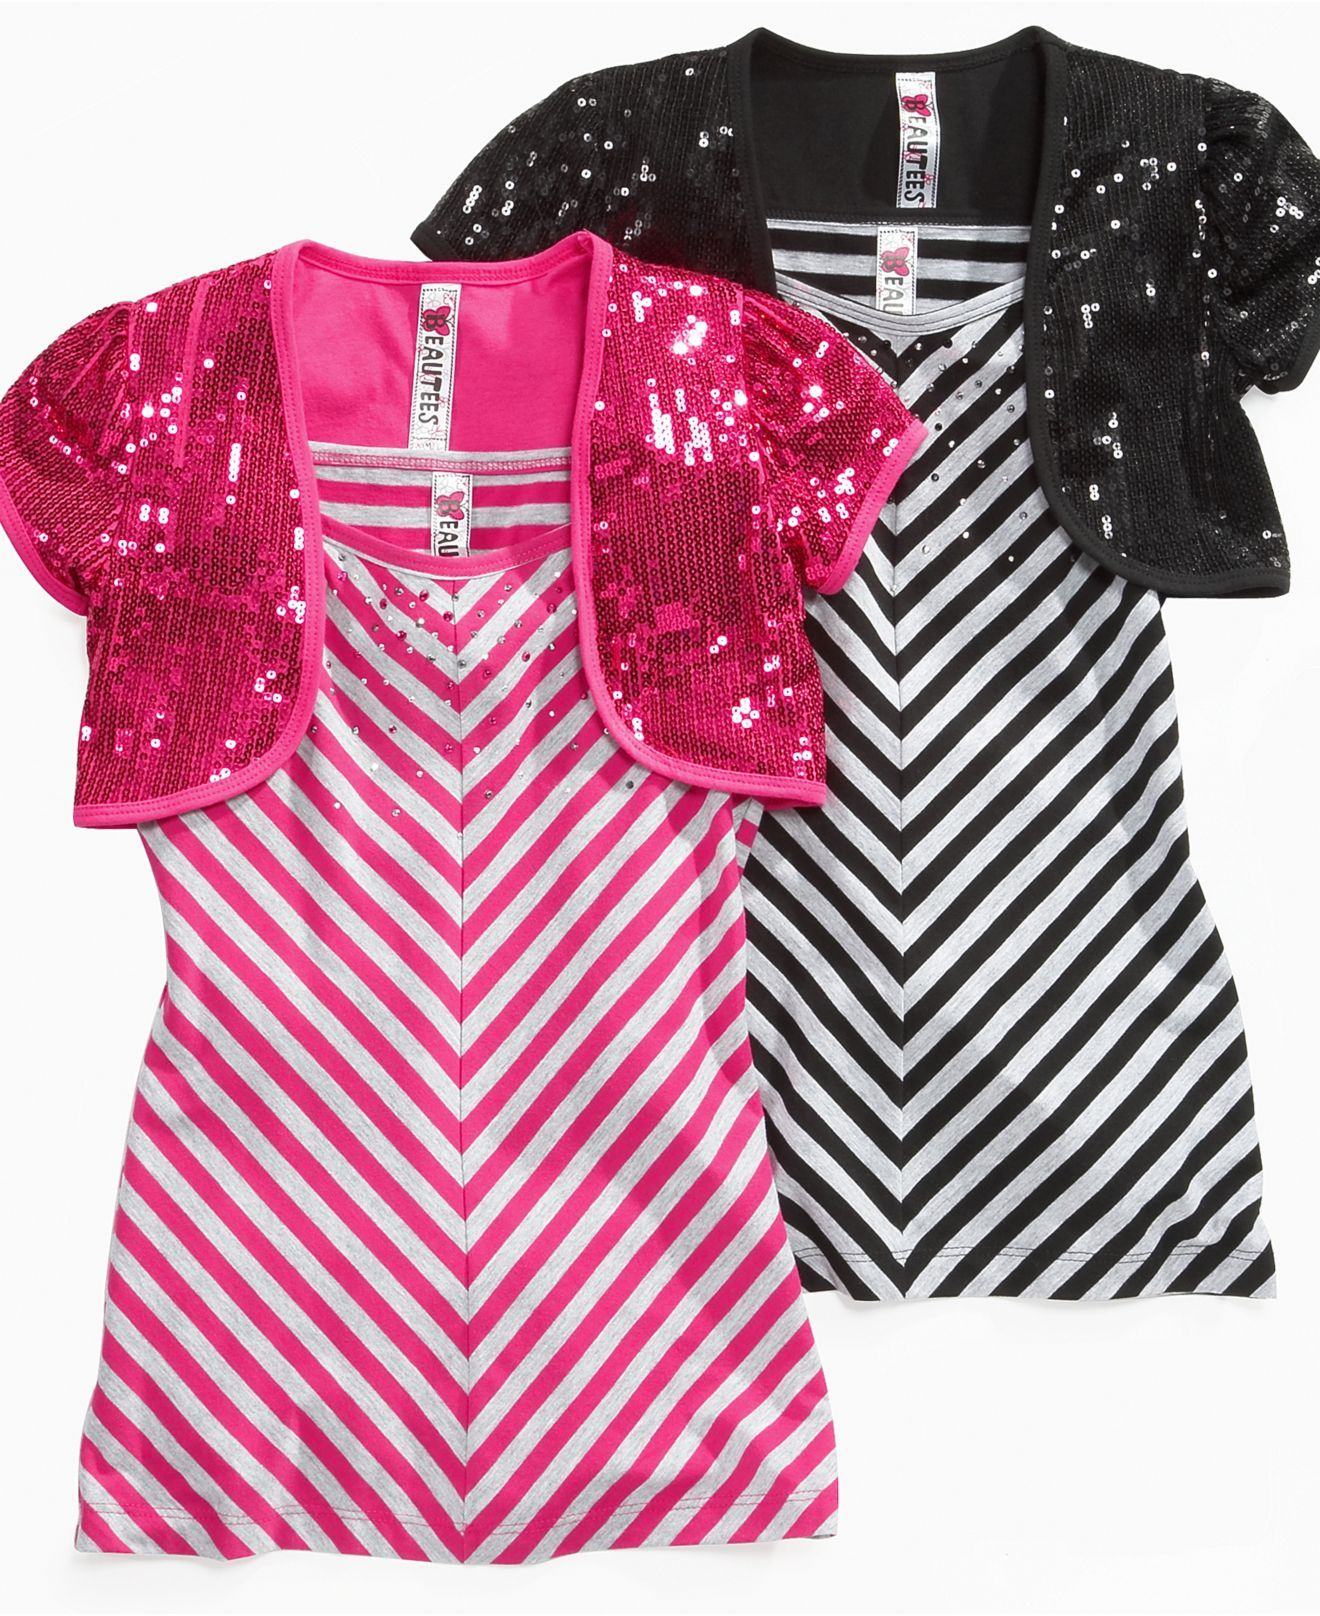 740e2e7cd Beautees Kids Shirt, Girls Striped Tank and Shrug - Kids Girls 7-16 - Macy's